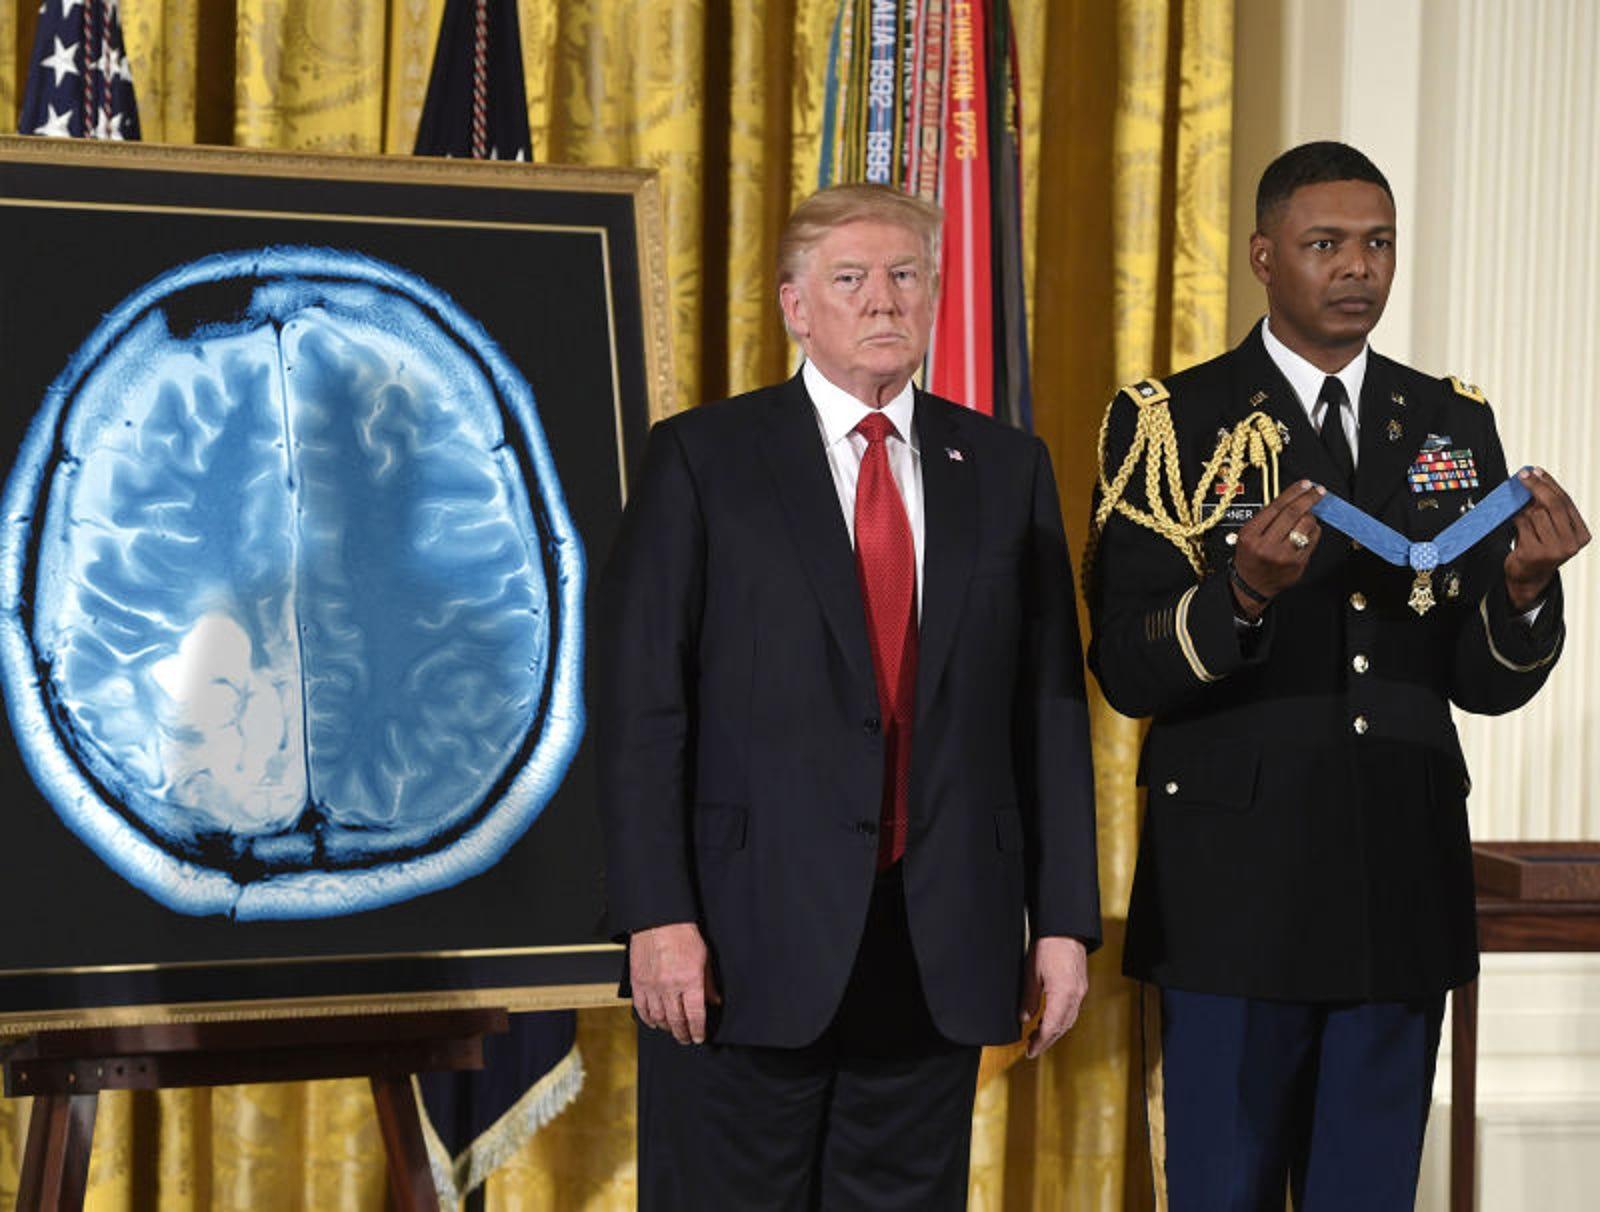 Trump Bestows Medal Of Honor On John McCain's Tumor